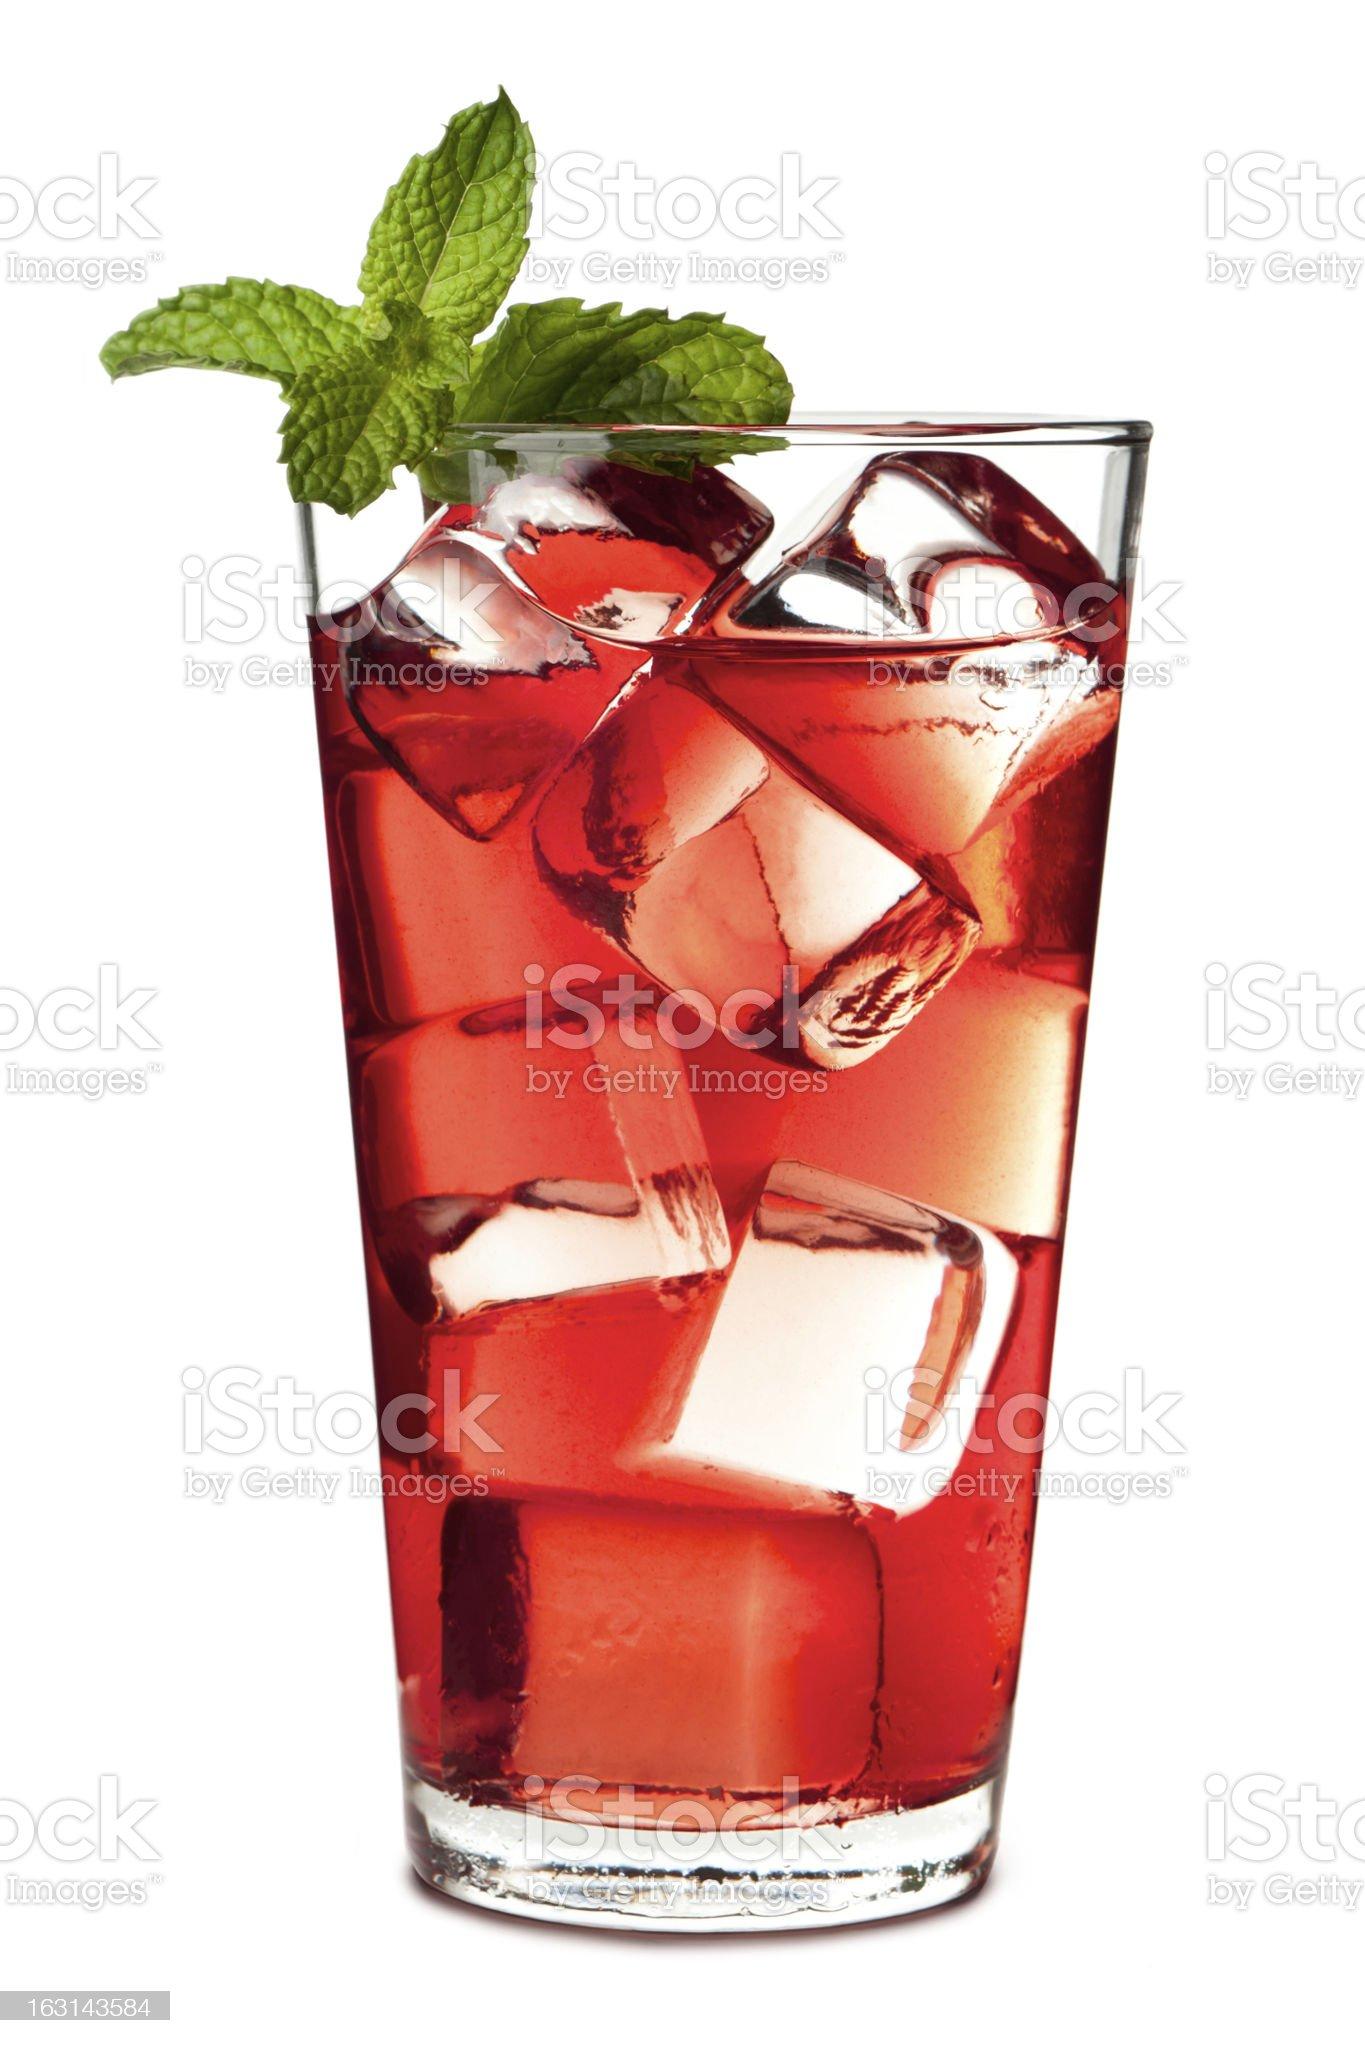 Cape Cod Cranberry Juice Isolated on White Background royalty-free stock photo